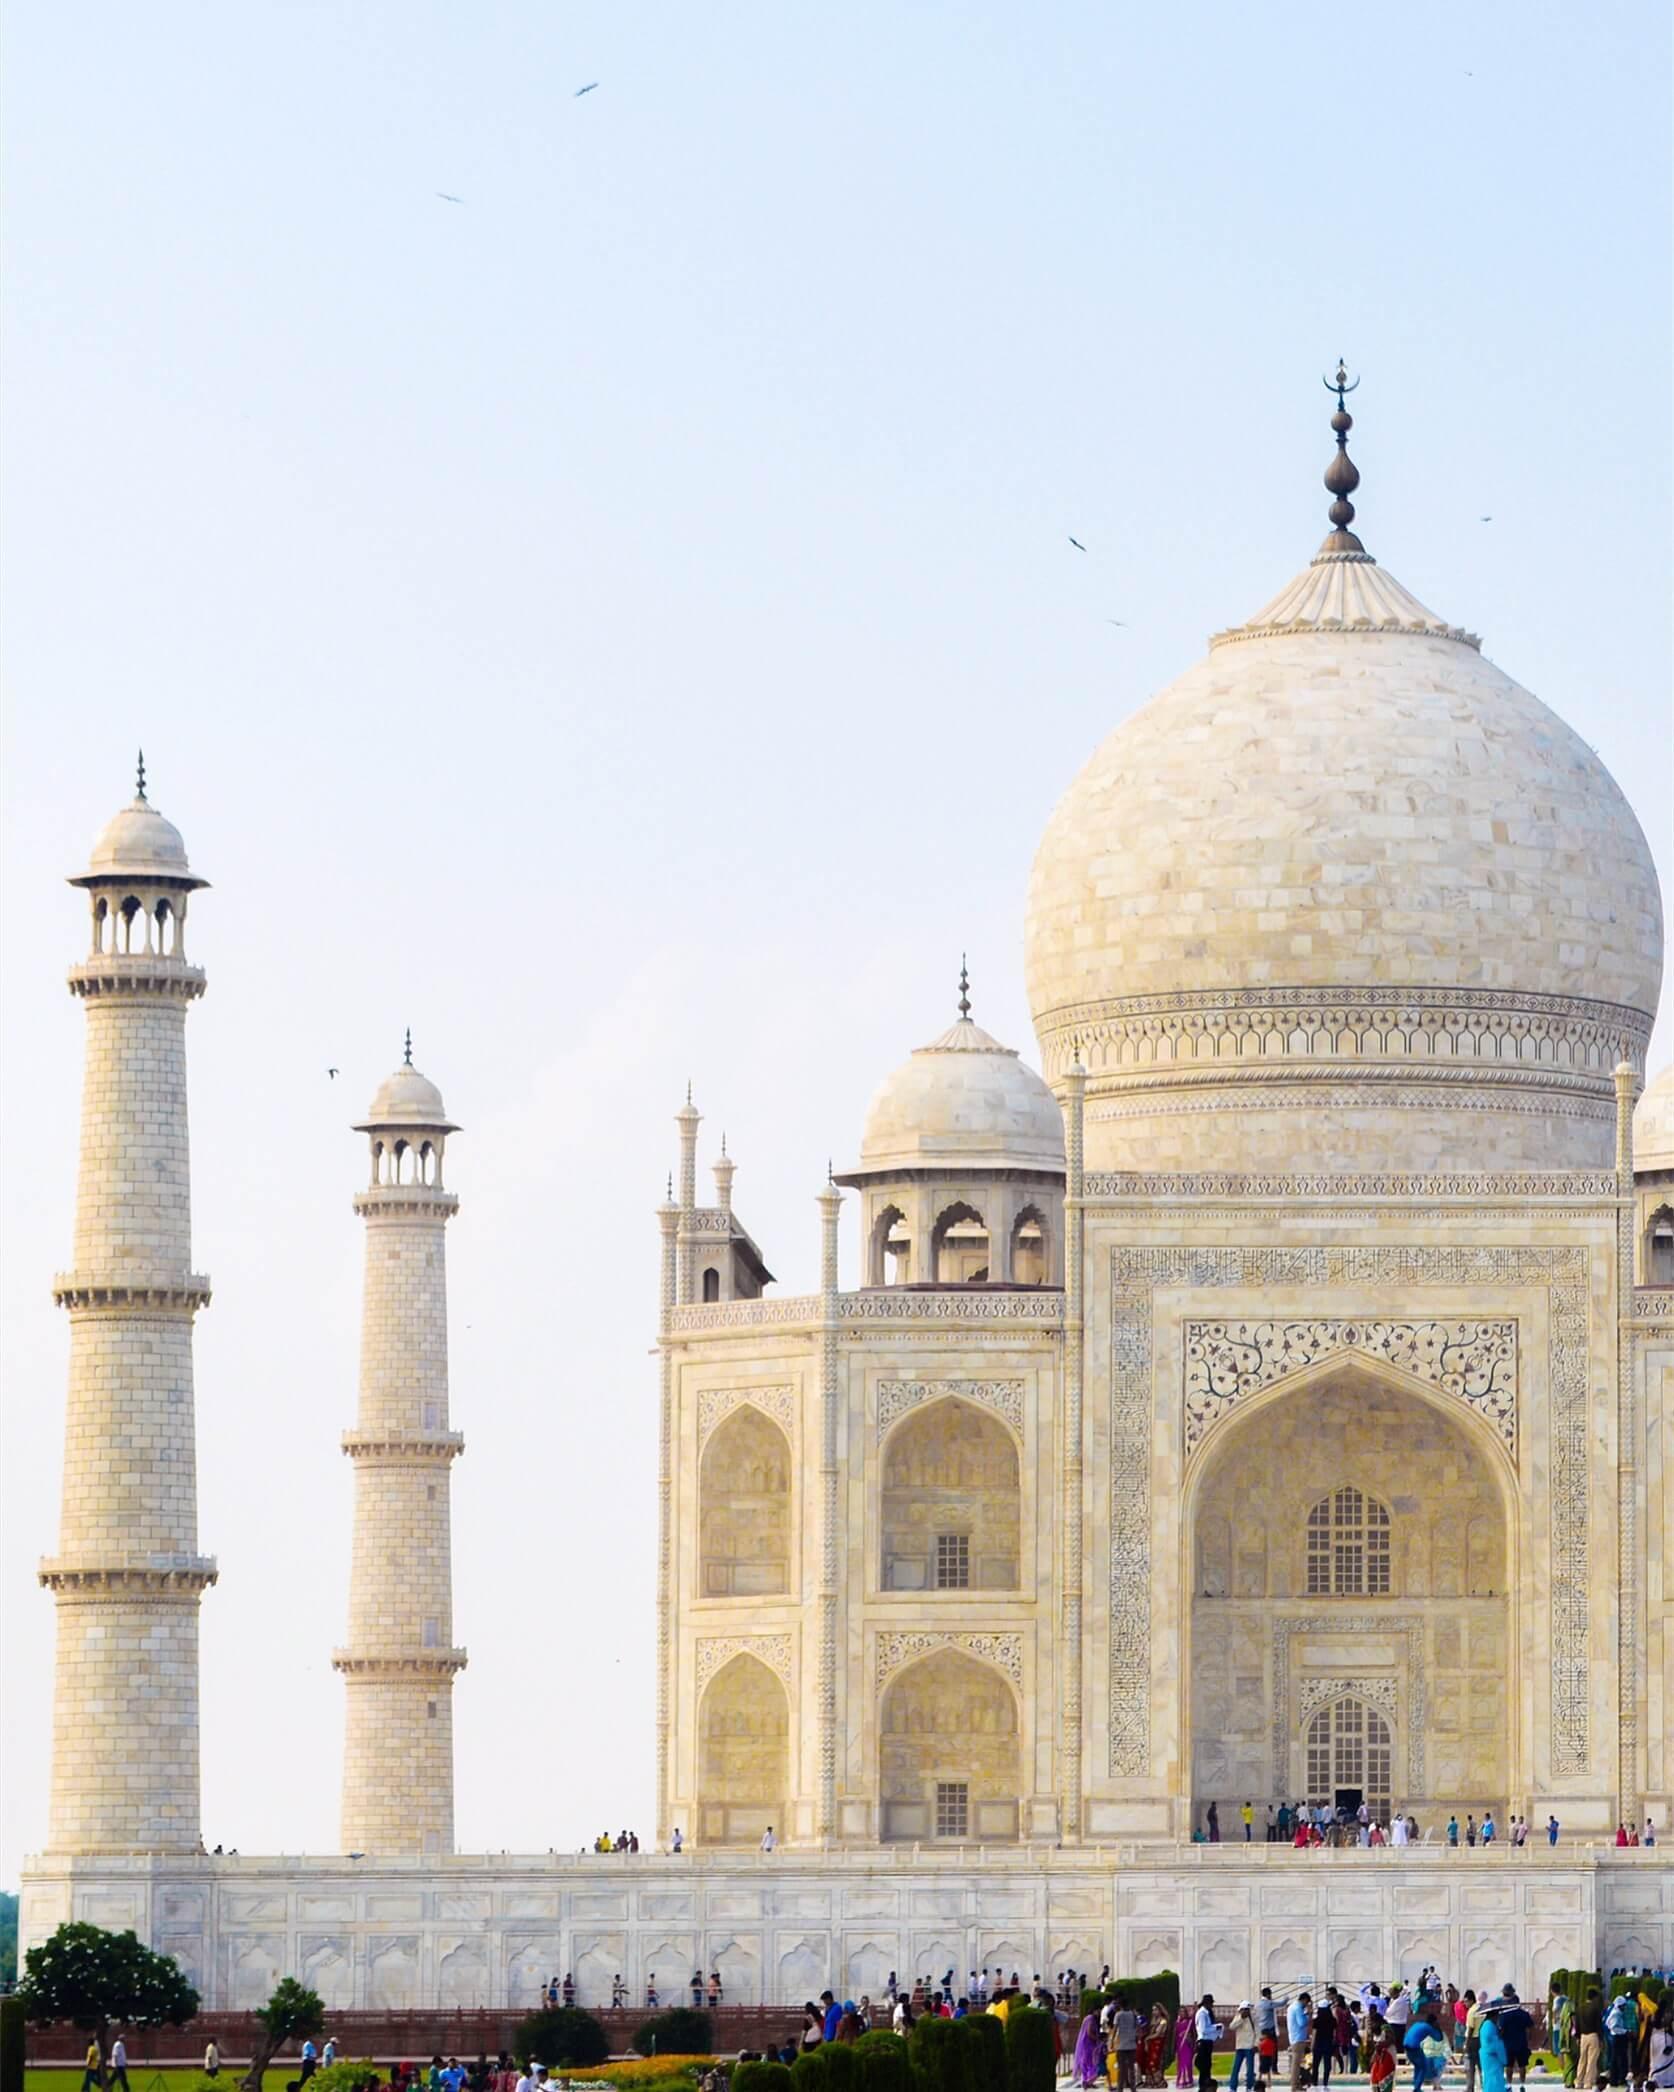 The Taj Mahal main building and pillars shining gold in the sunlight